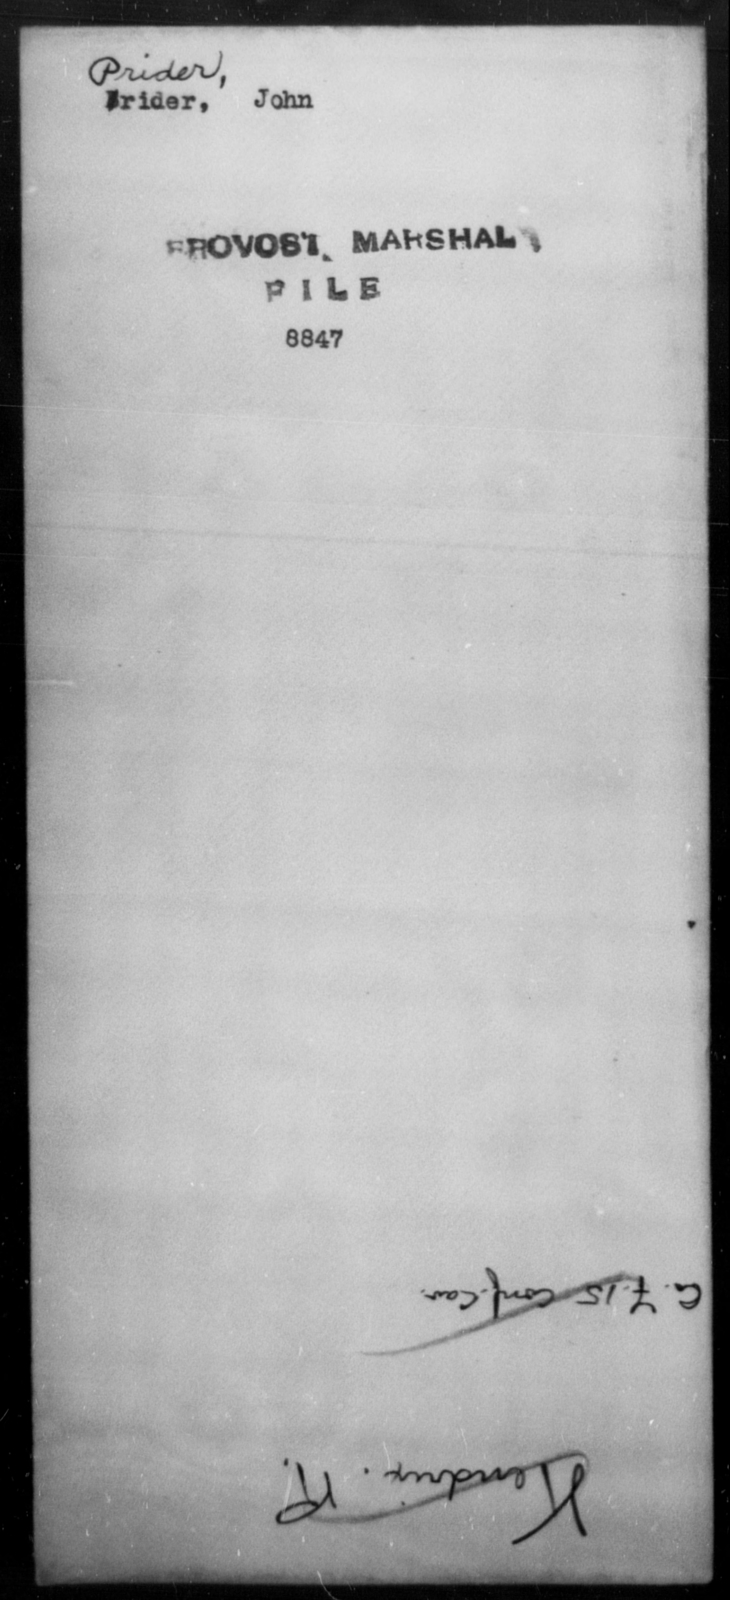 Prider, John - State: [Blank] - Year: [Blank]